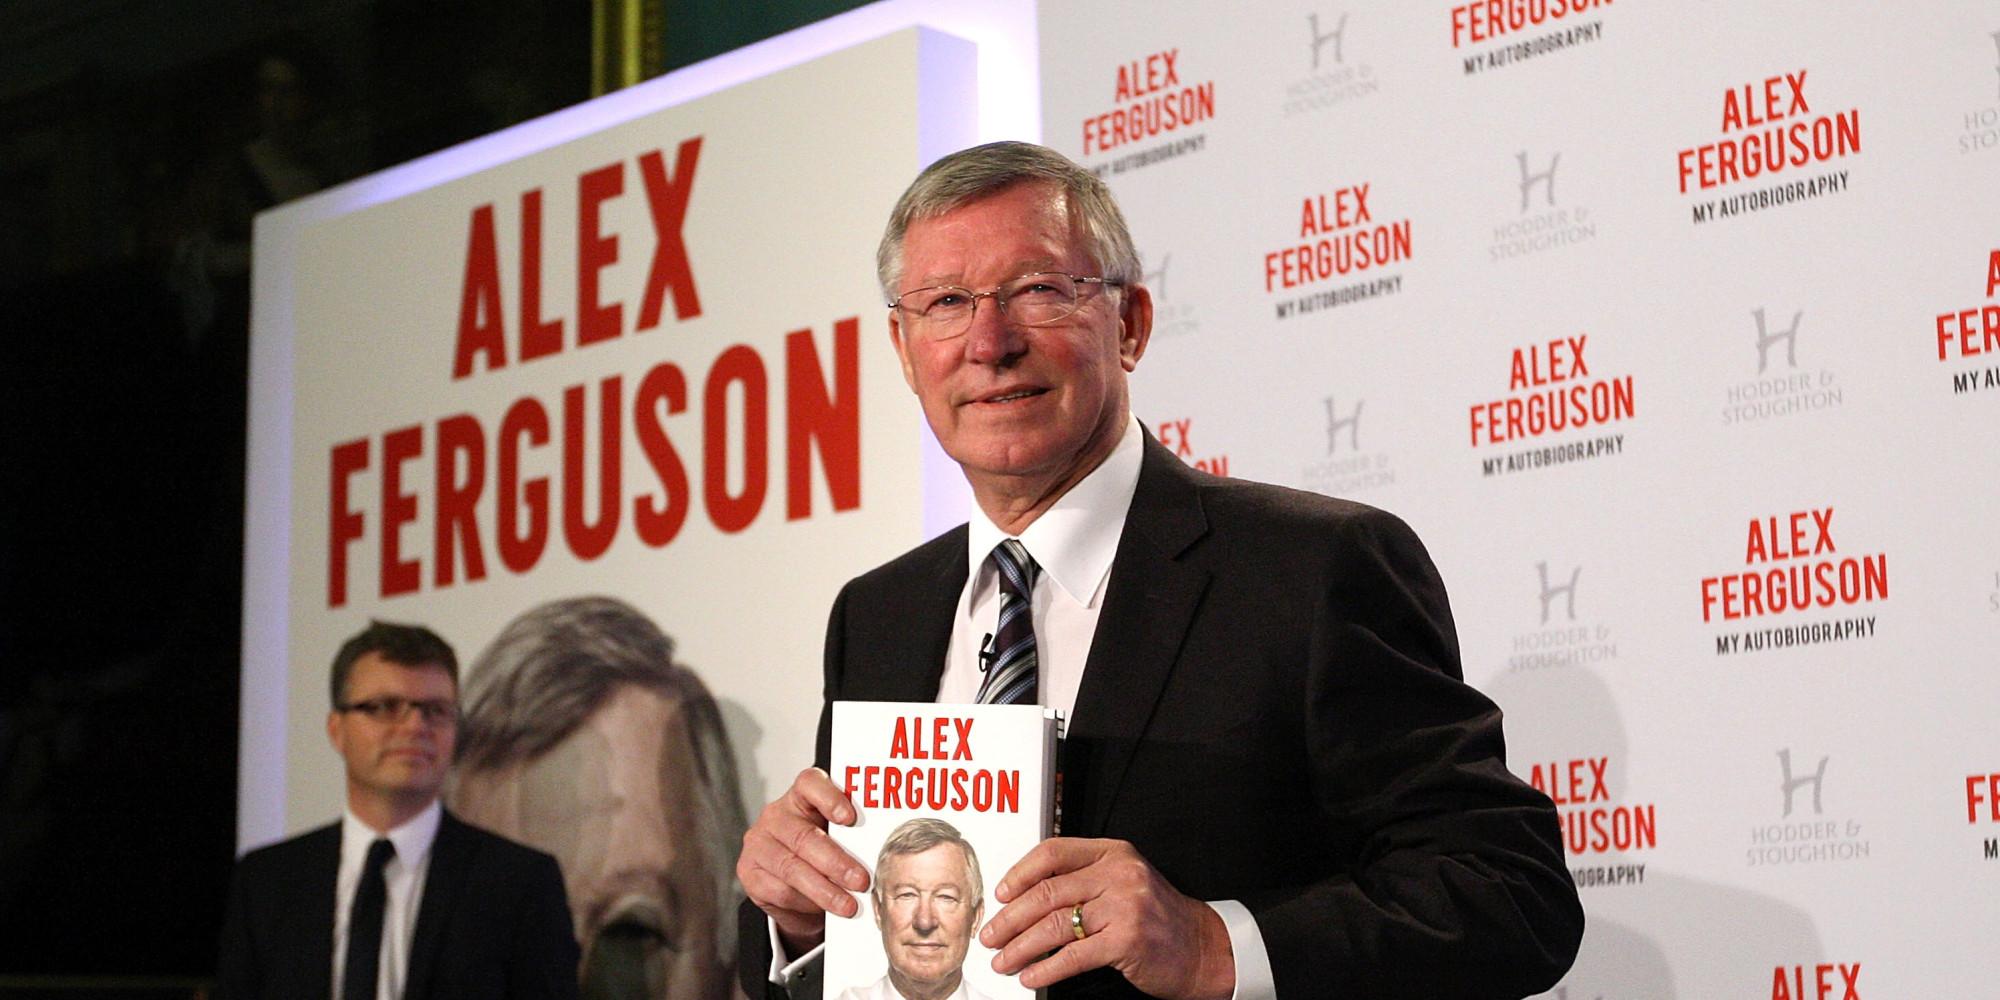 alex ferguson my autobiography ferguson alex Find great deals on ebay for alex ferguson my autobiography and alex ferguson my autobiography signed shop with confidence.